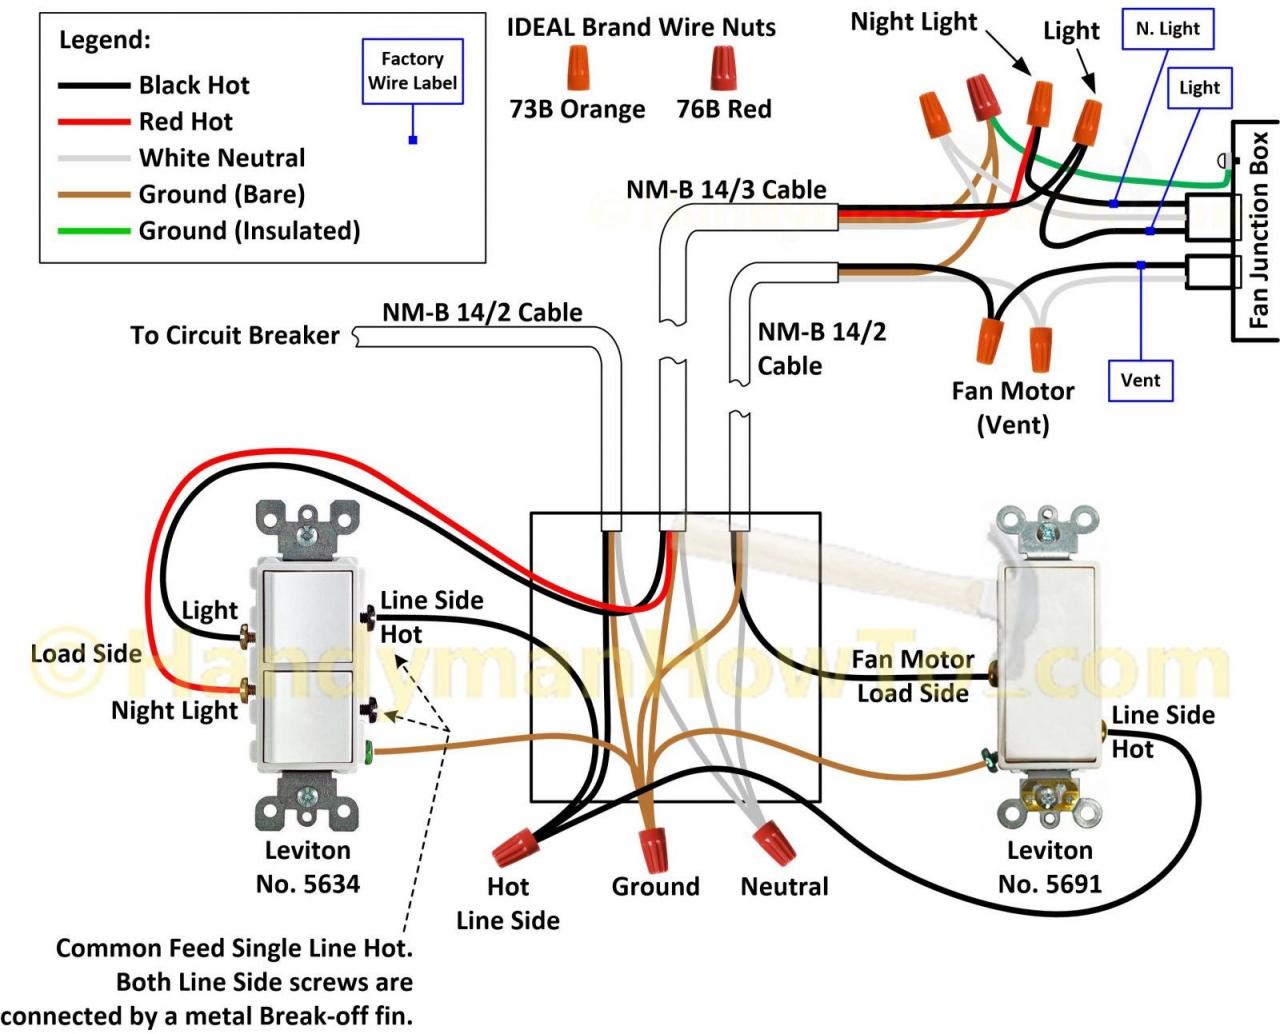 Nutone Doorbell Wiring Diagram Electric - Data Wiring Diagram Today - Nutone Doorbell Wiring Diagram